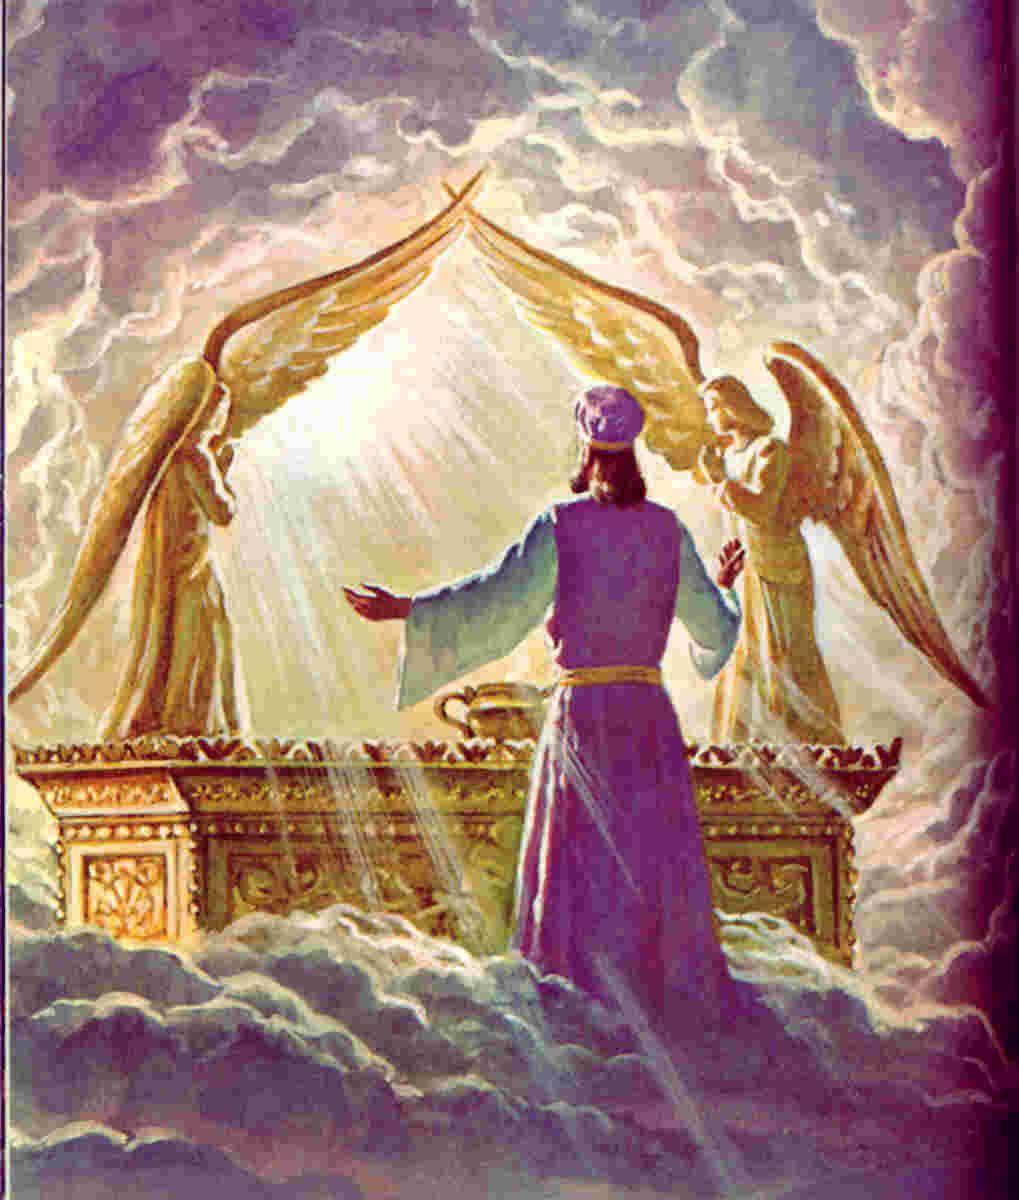 The High Priest Seeks Yahweh In Prayer Before The Ark Of